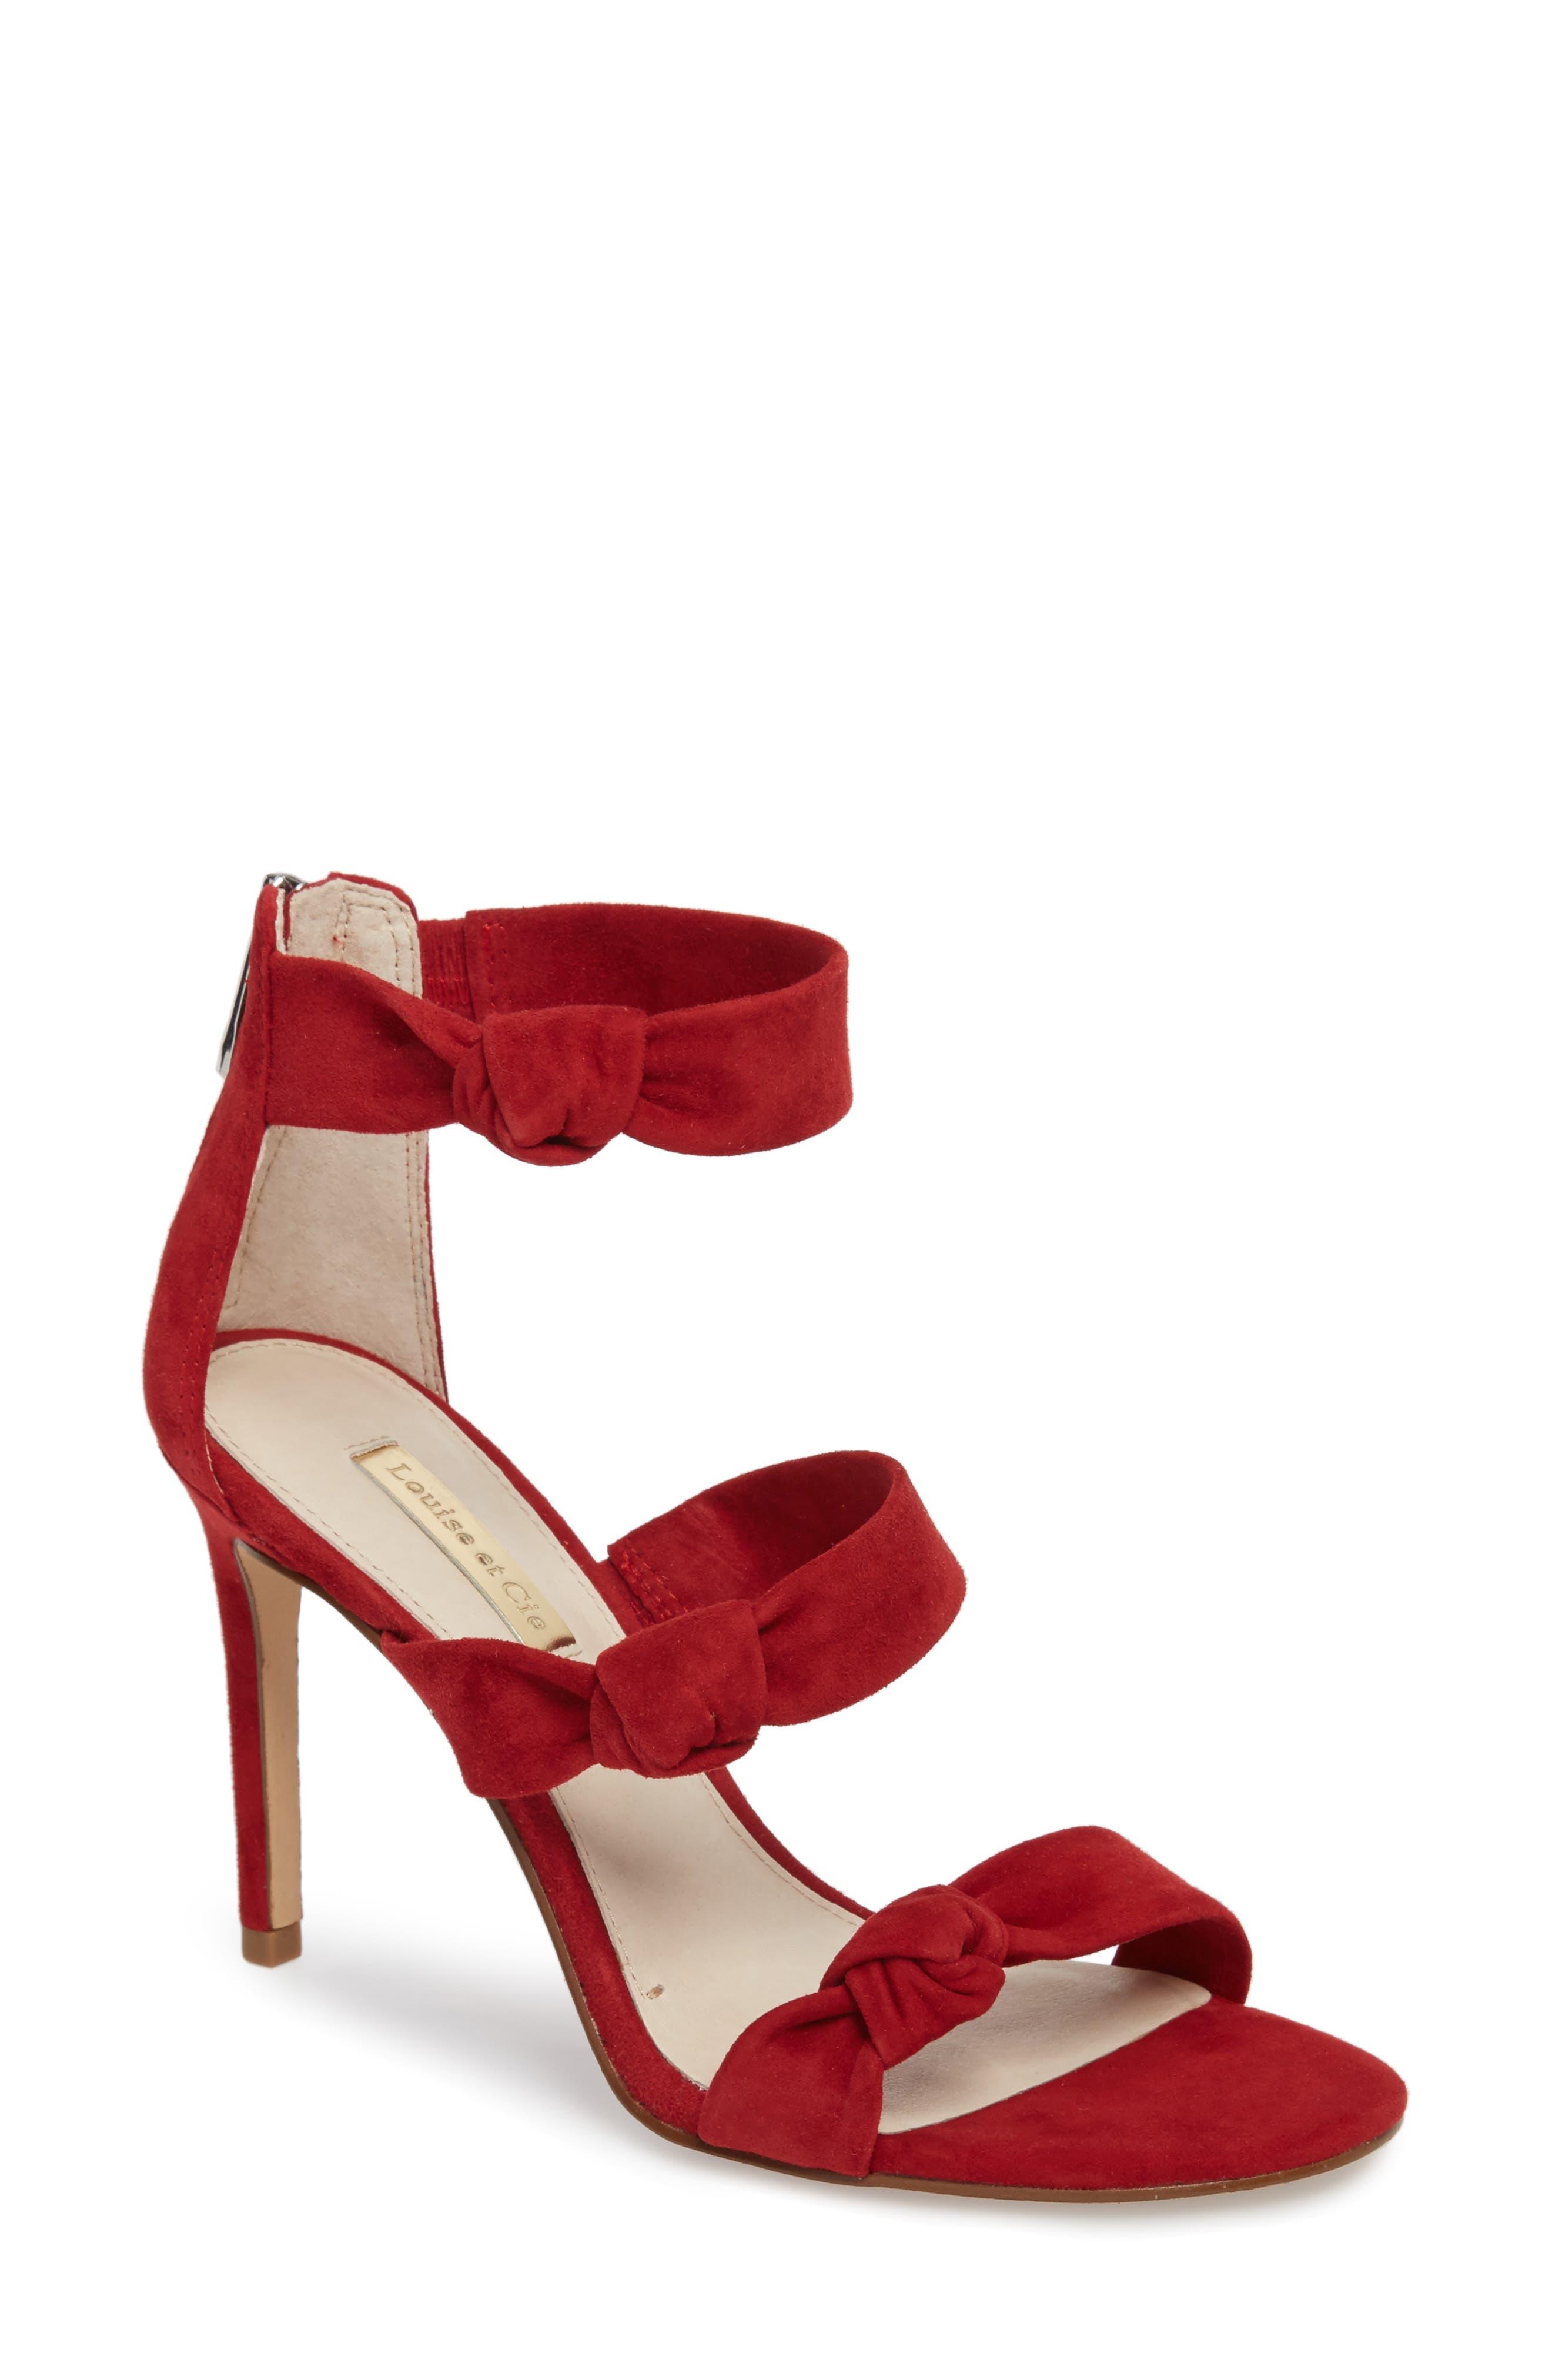 Klarissa Sandal,                         Main,                         color, Cherry Red Suede